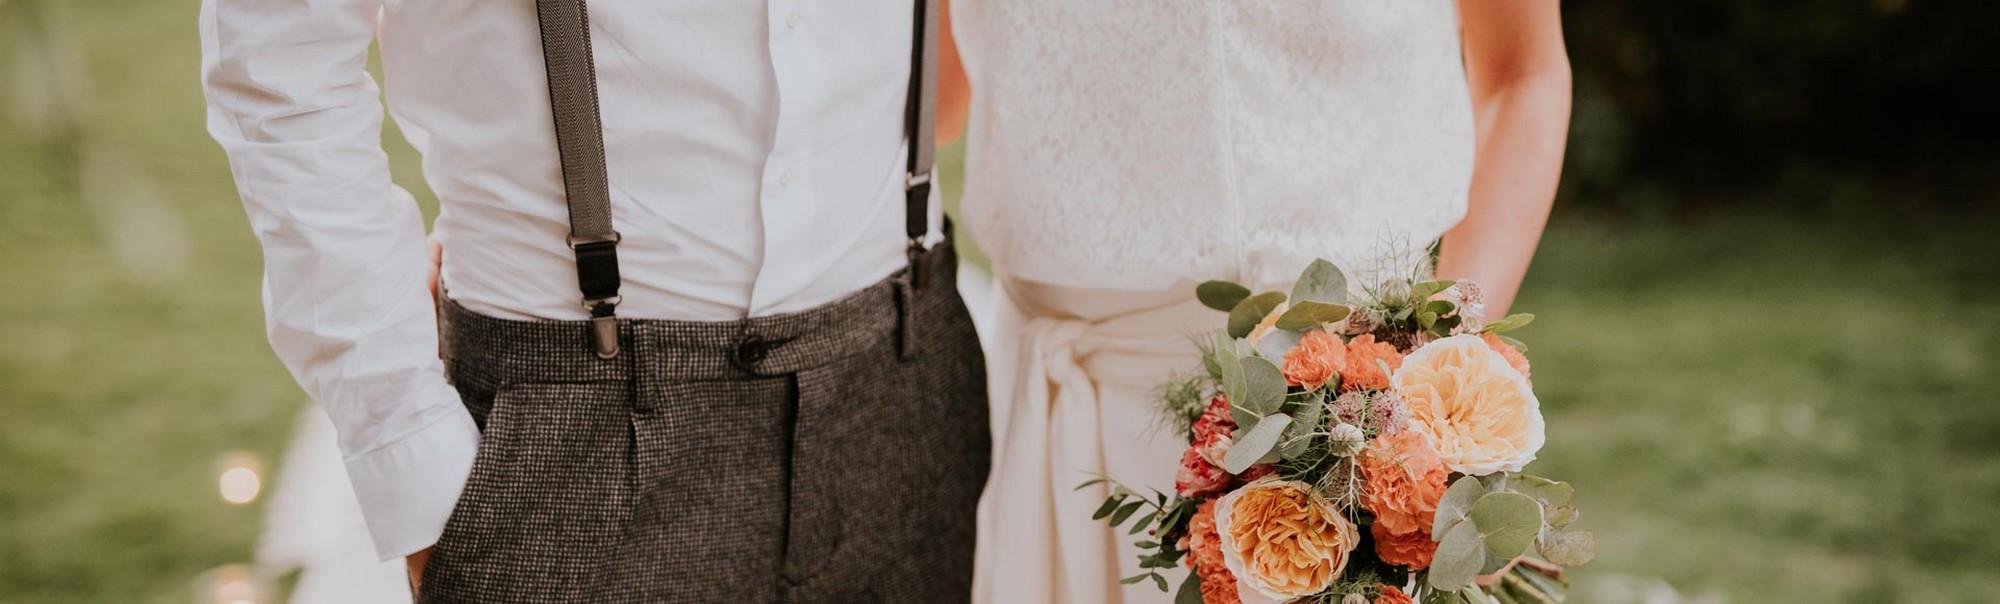 wedding planner lens lille arras